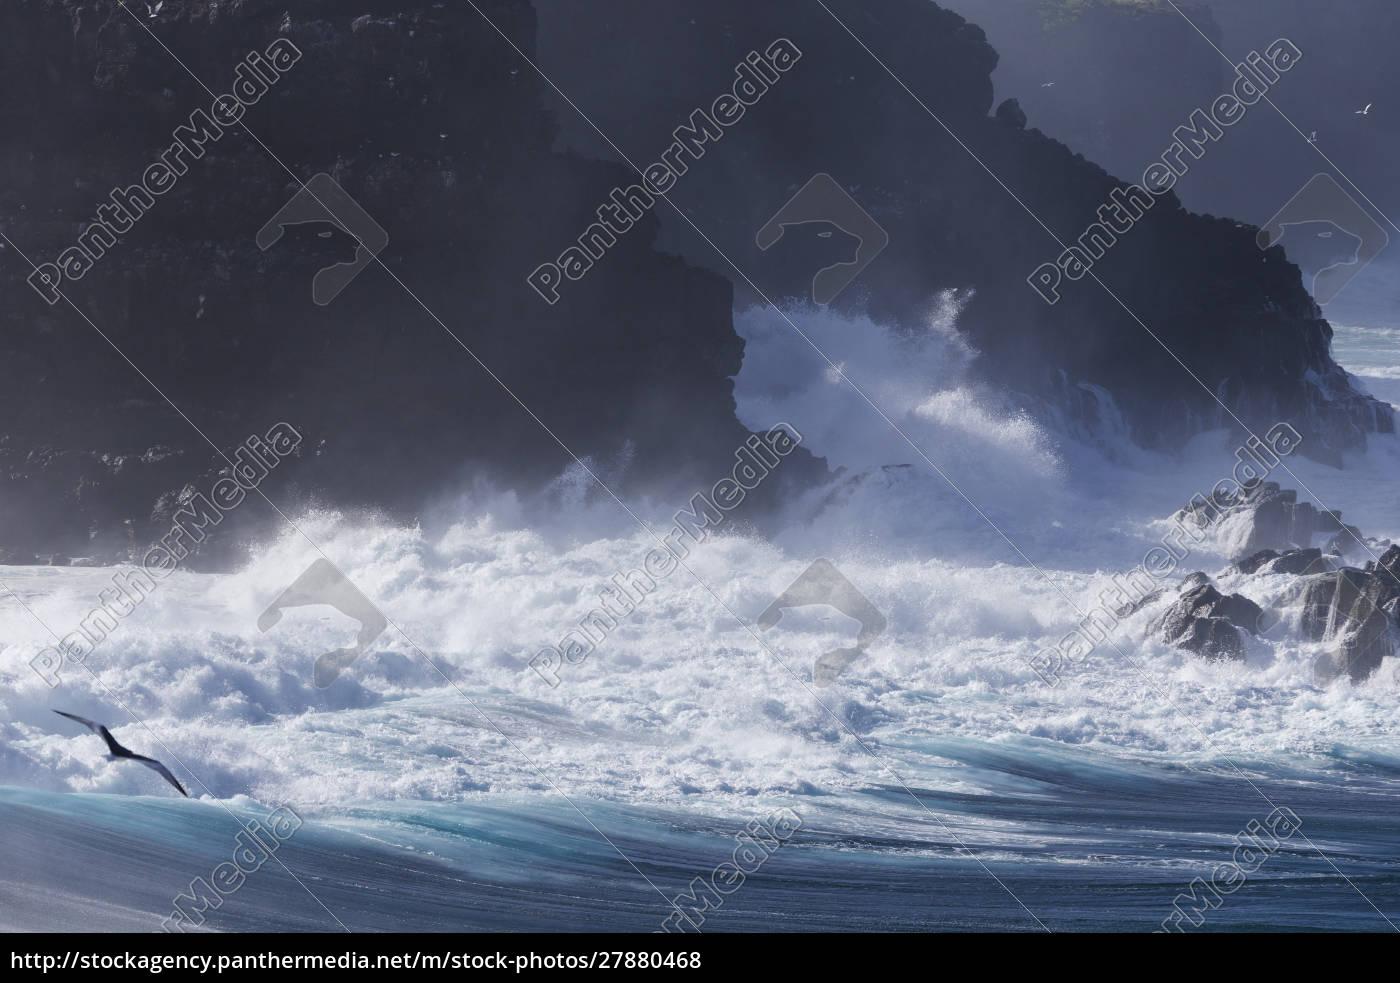 ecuador, galapagosinseln, espanola, punta, suarez., felsige, küste. - 27880468